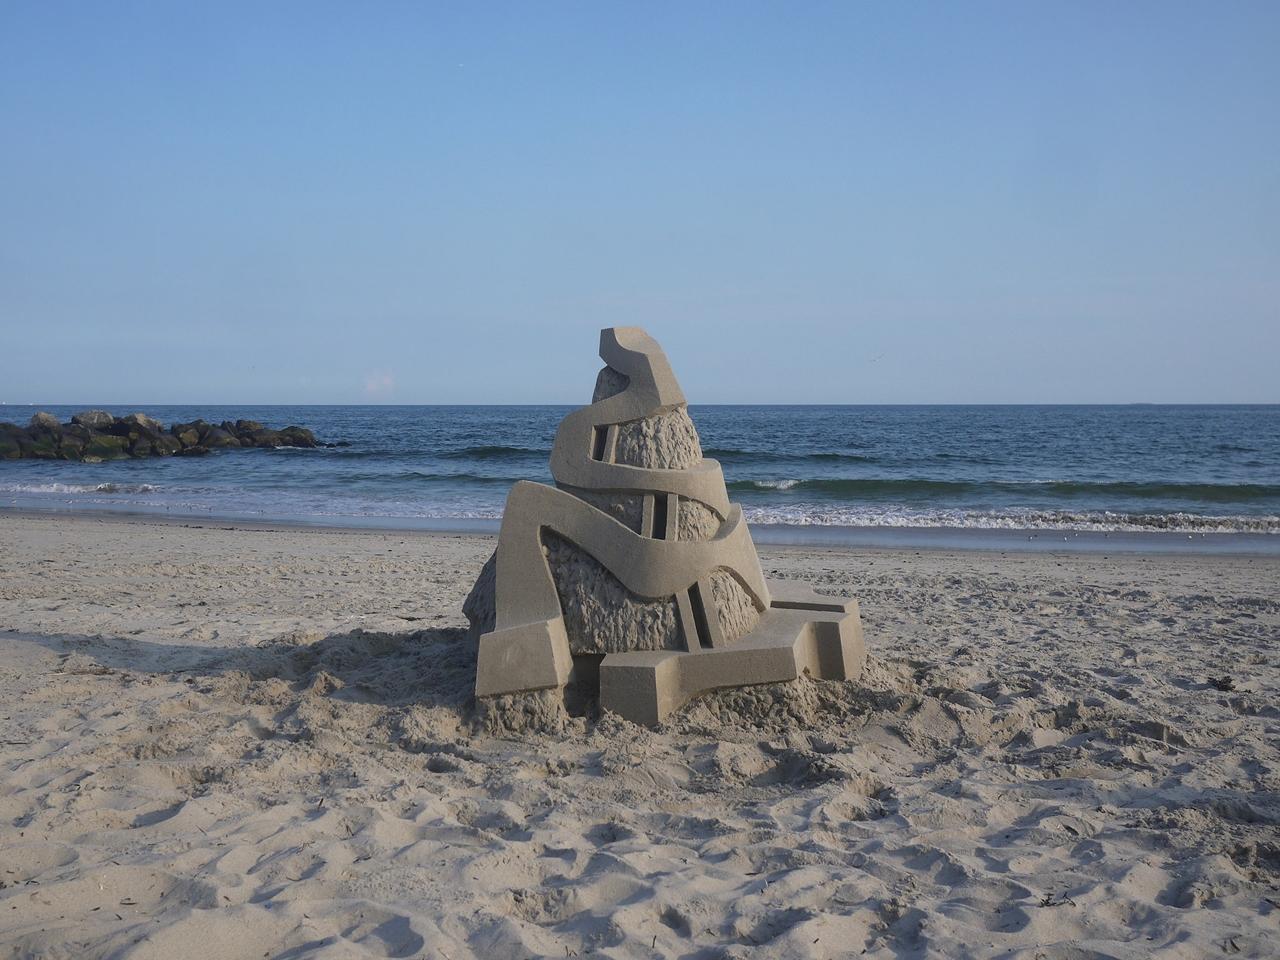 sand-castles-08